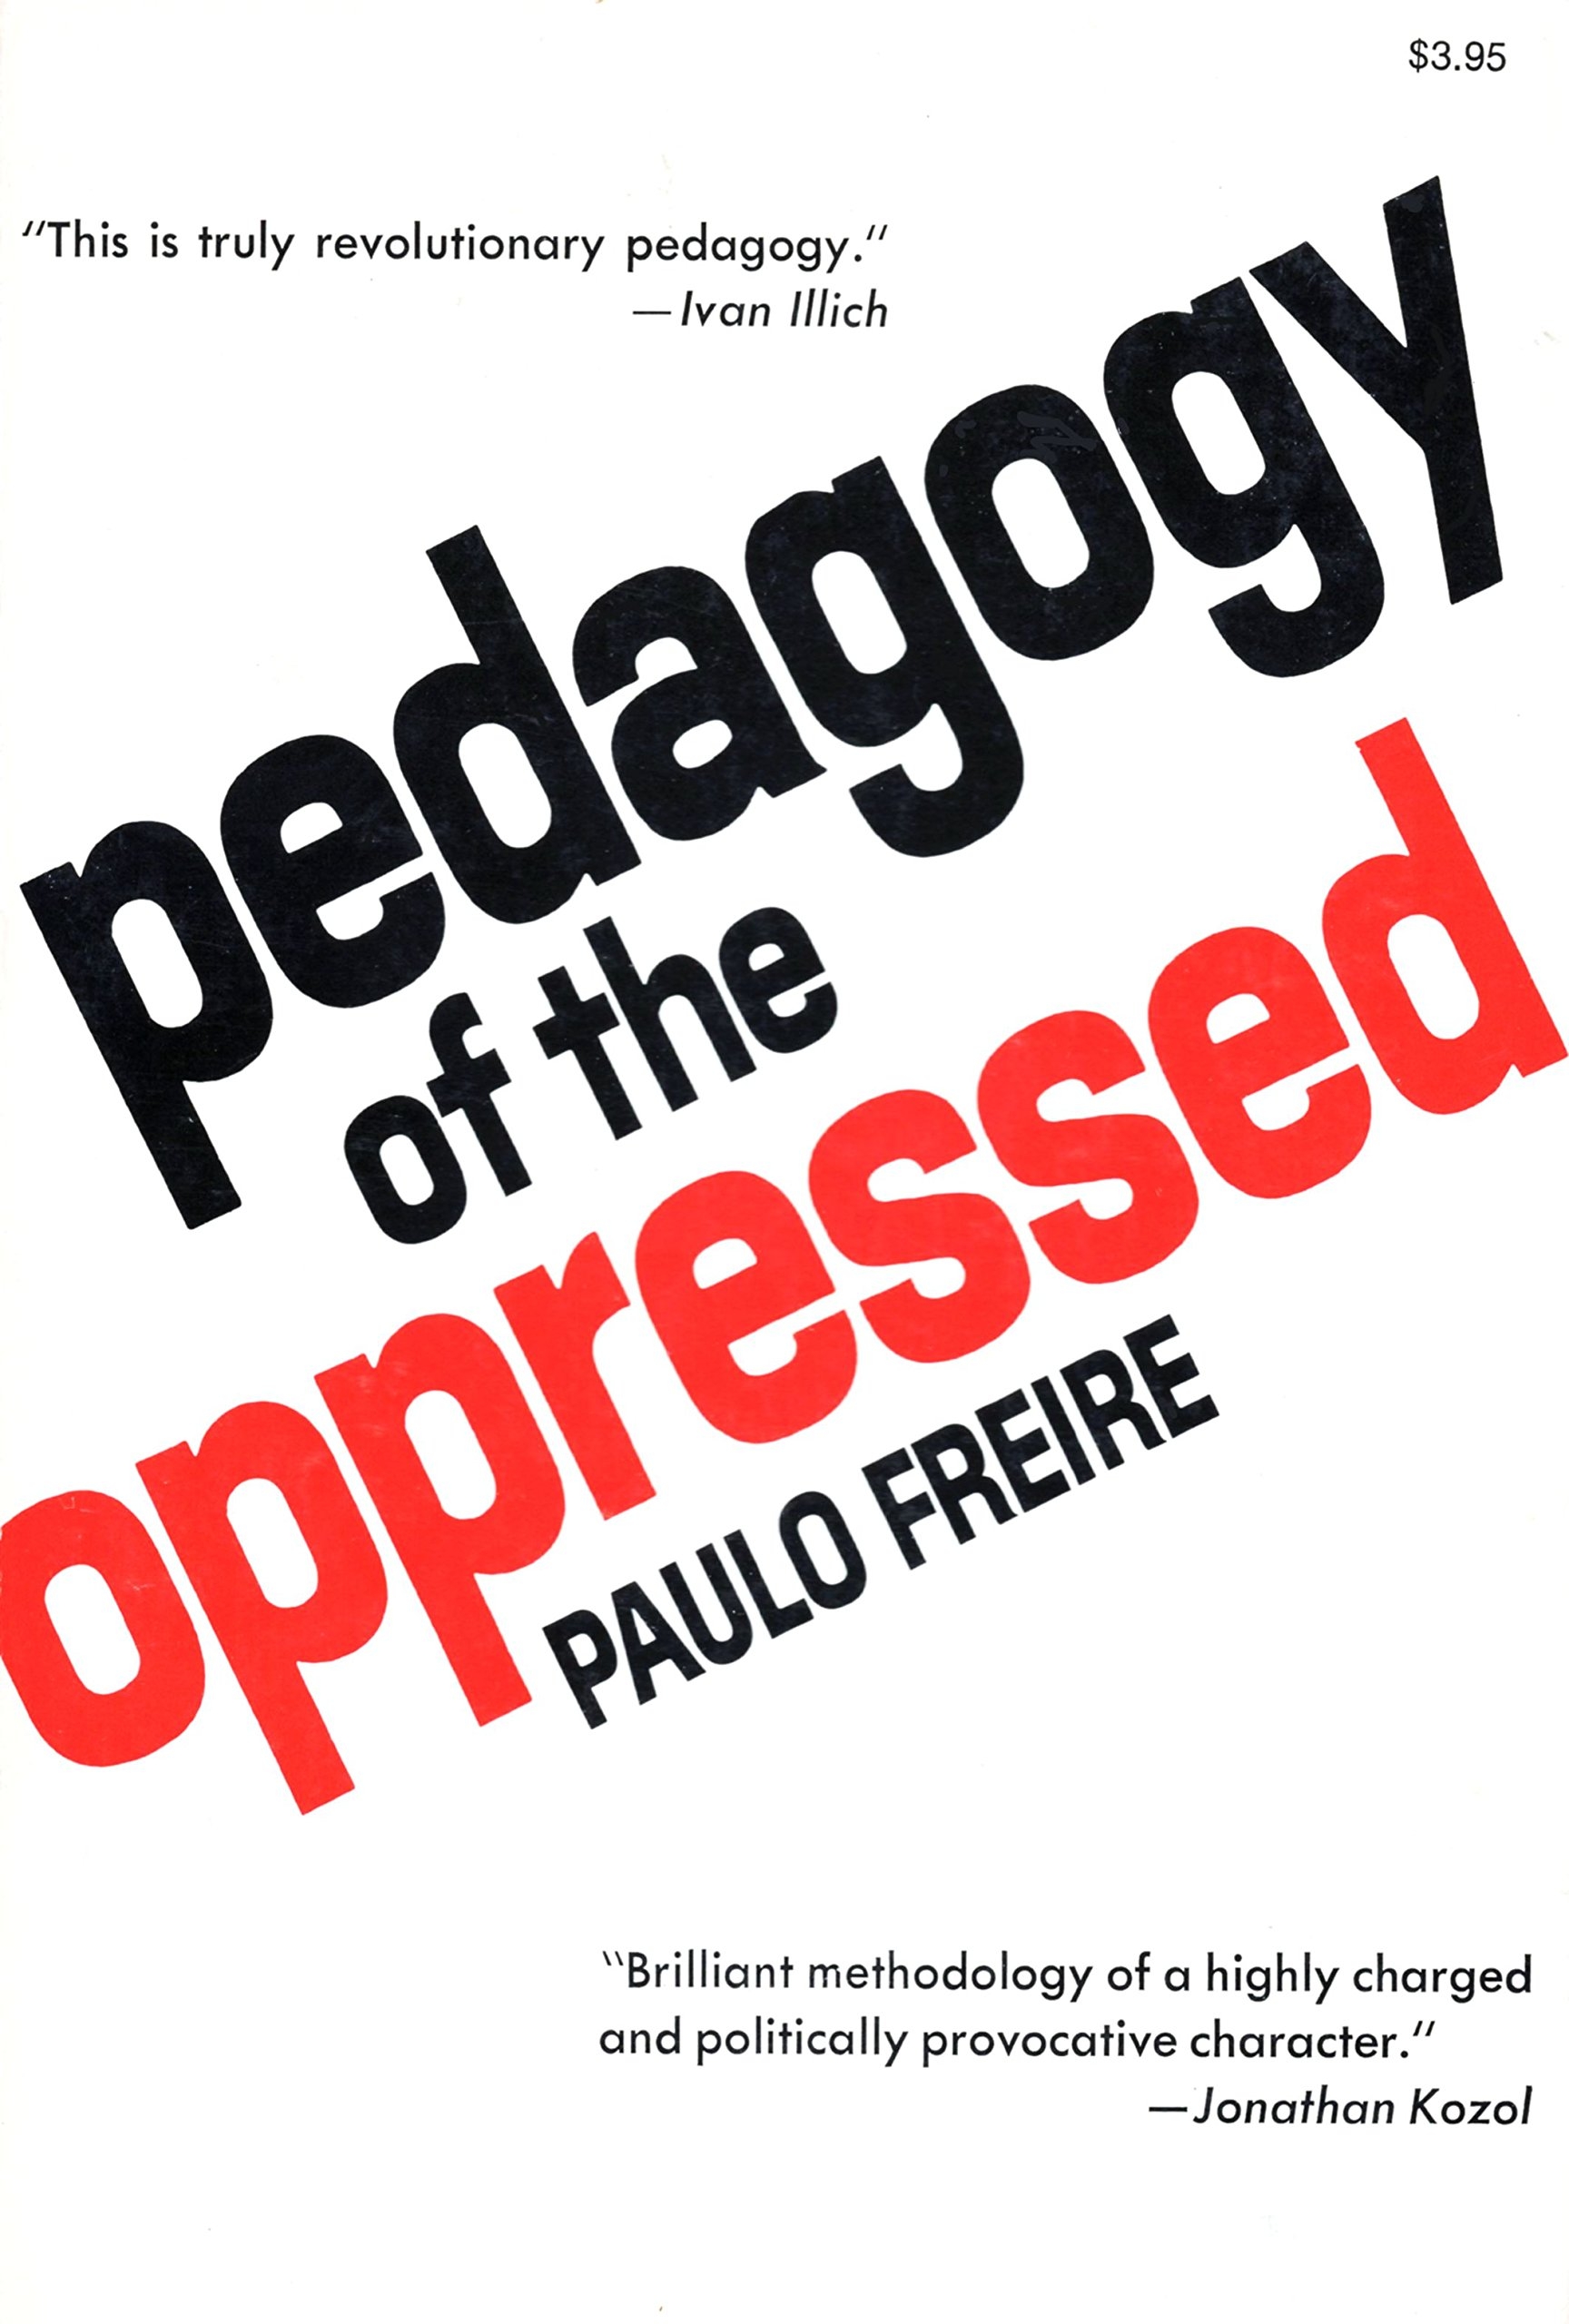 Freire.jpg